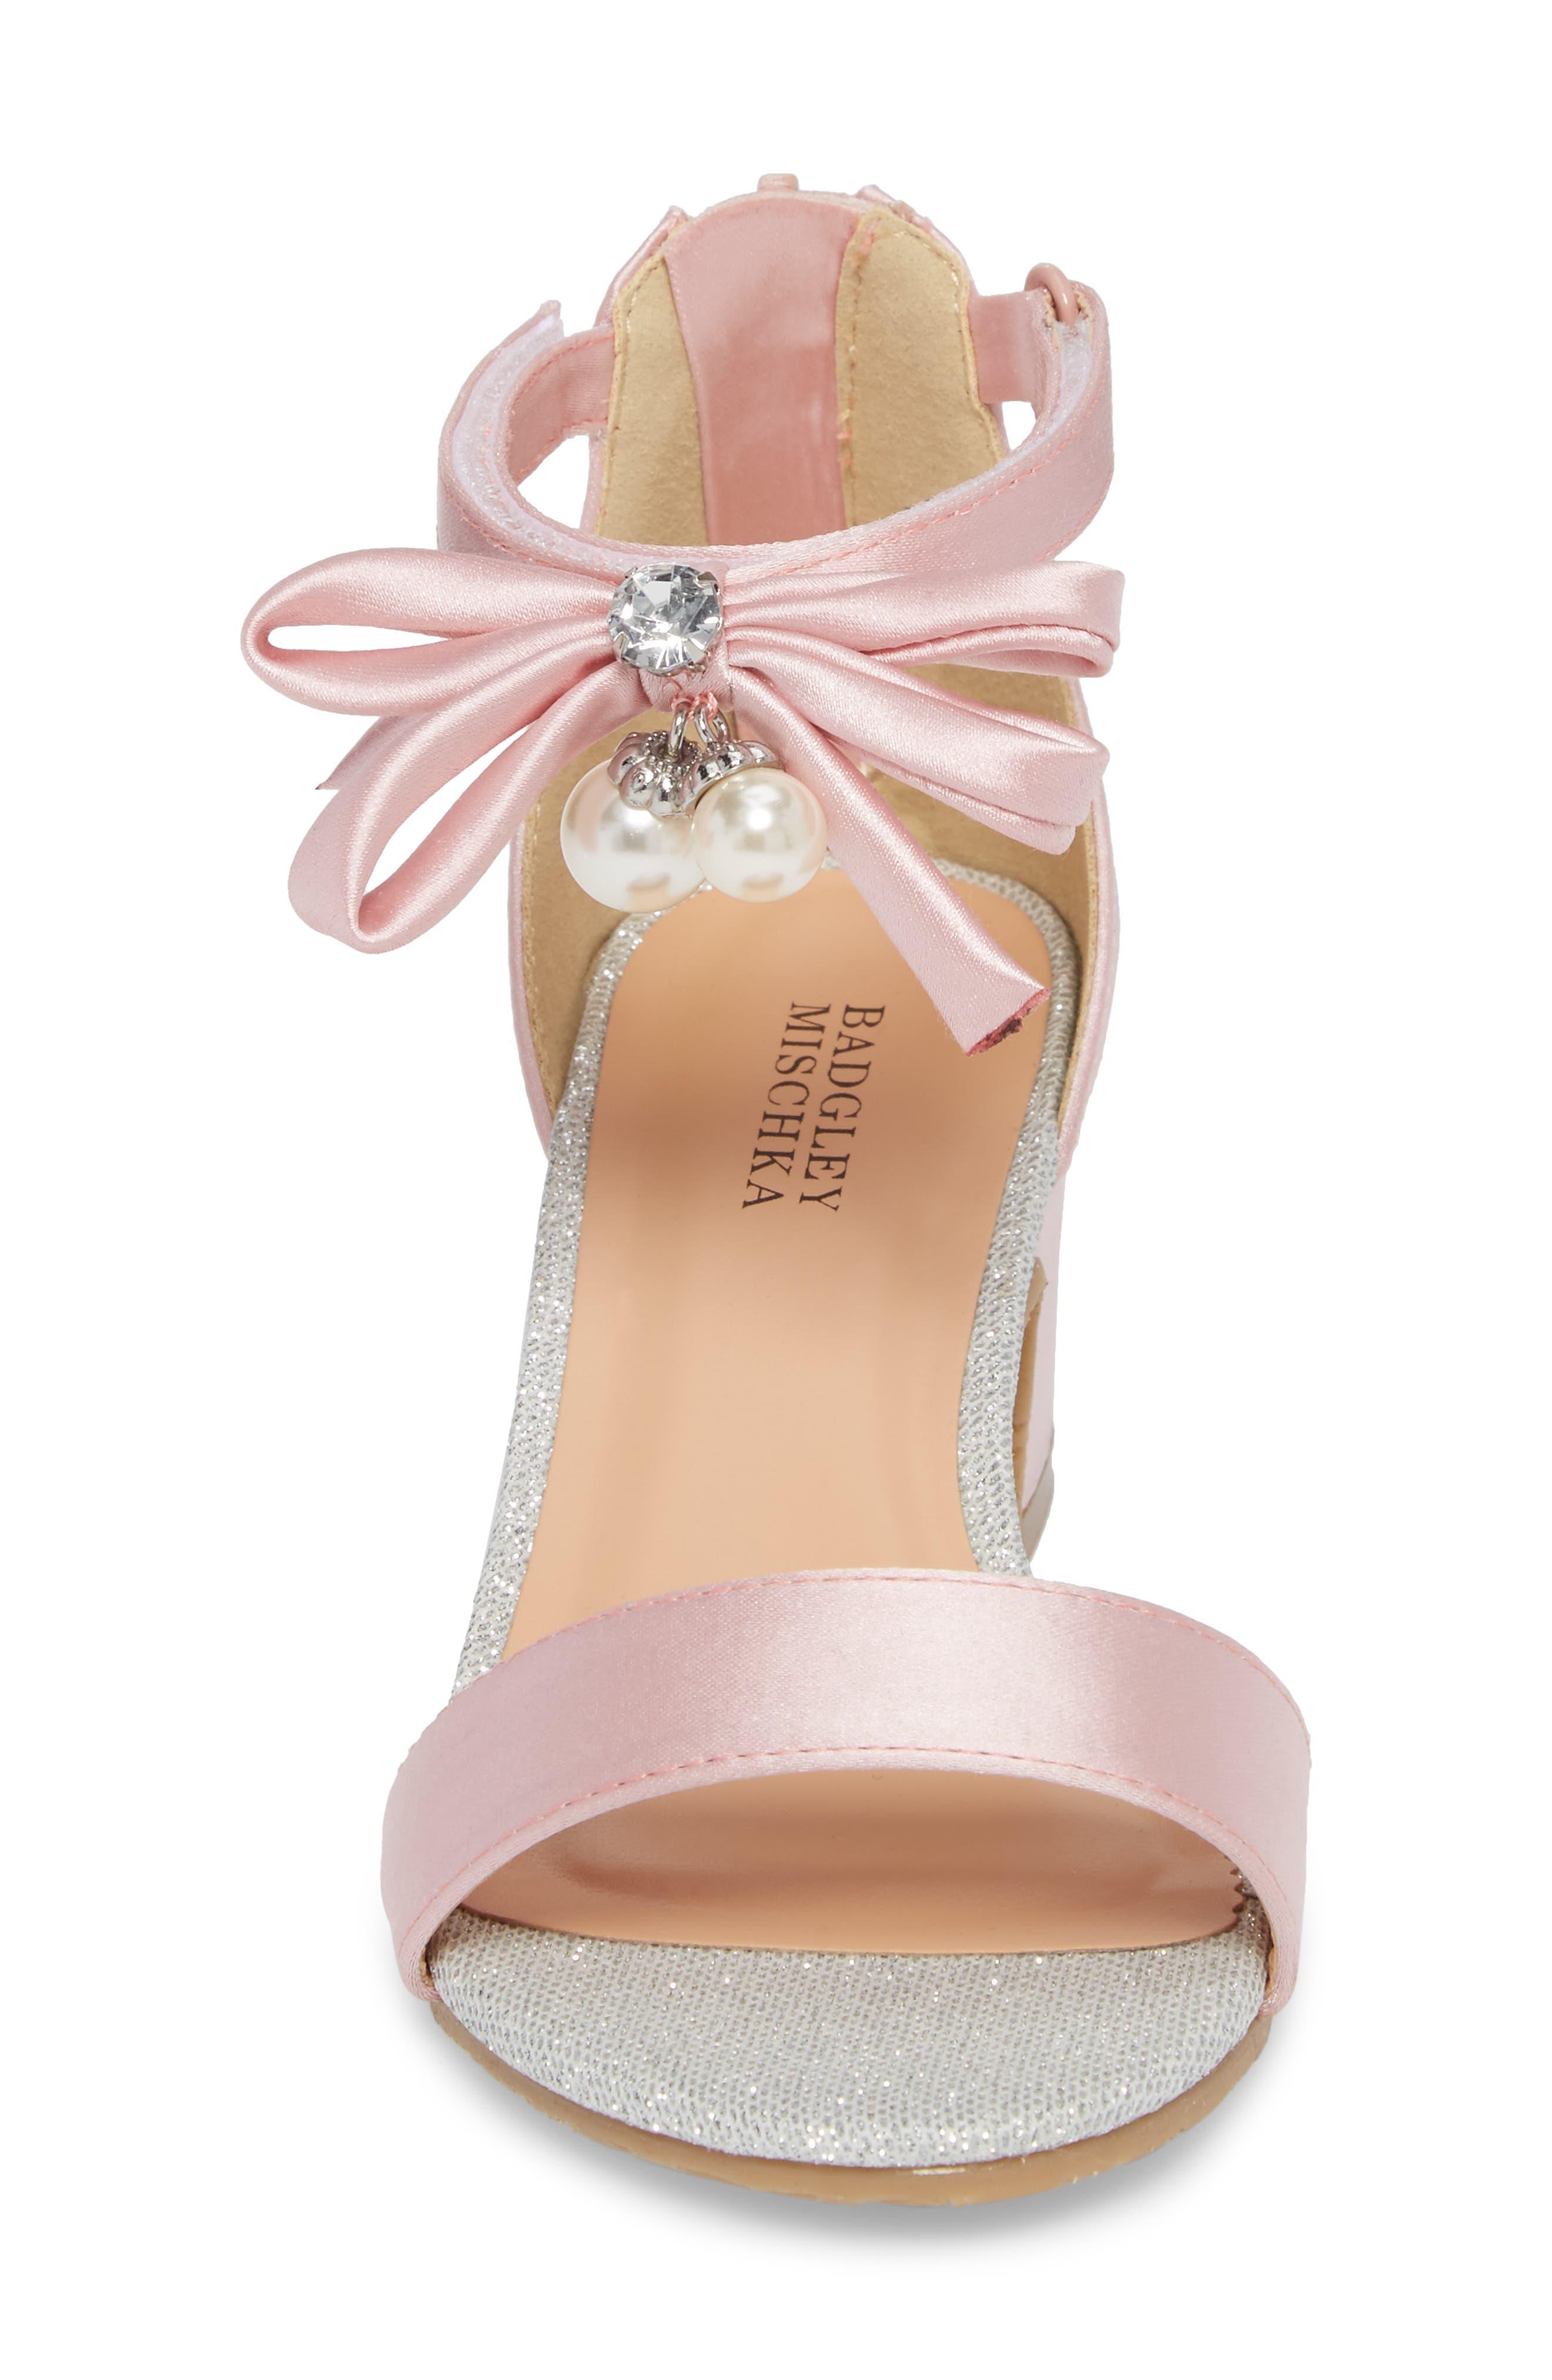 Pernia Embellished Sandal,                             Alternate thumbnail 4, color,                             PINK/ SILVER